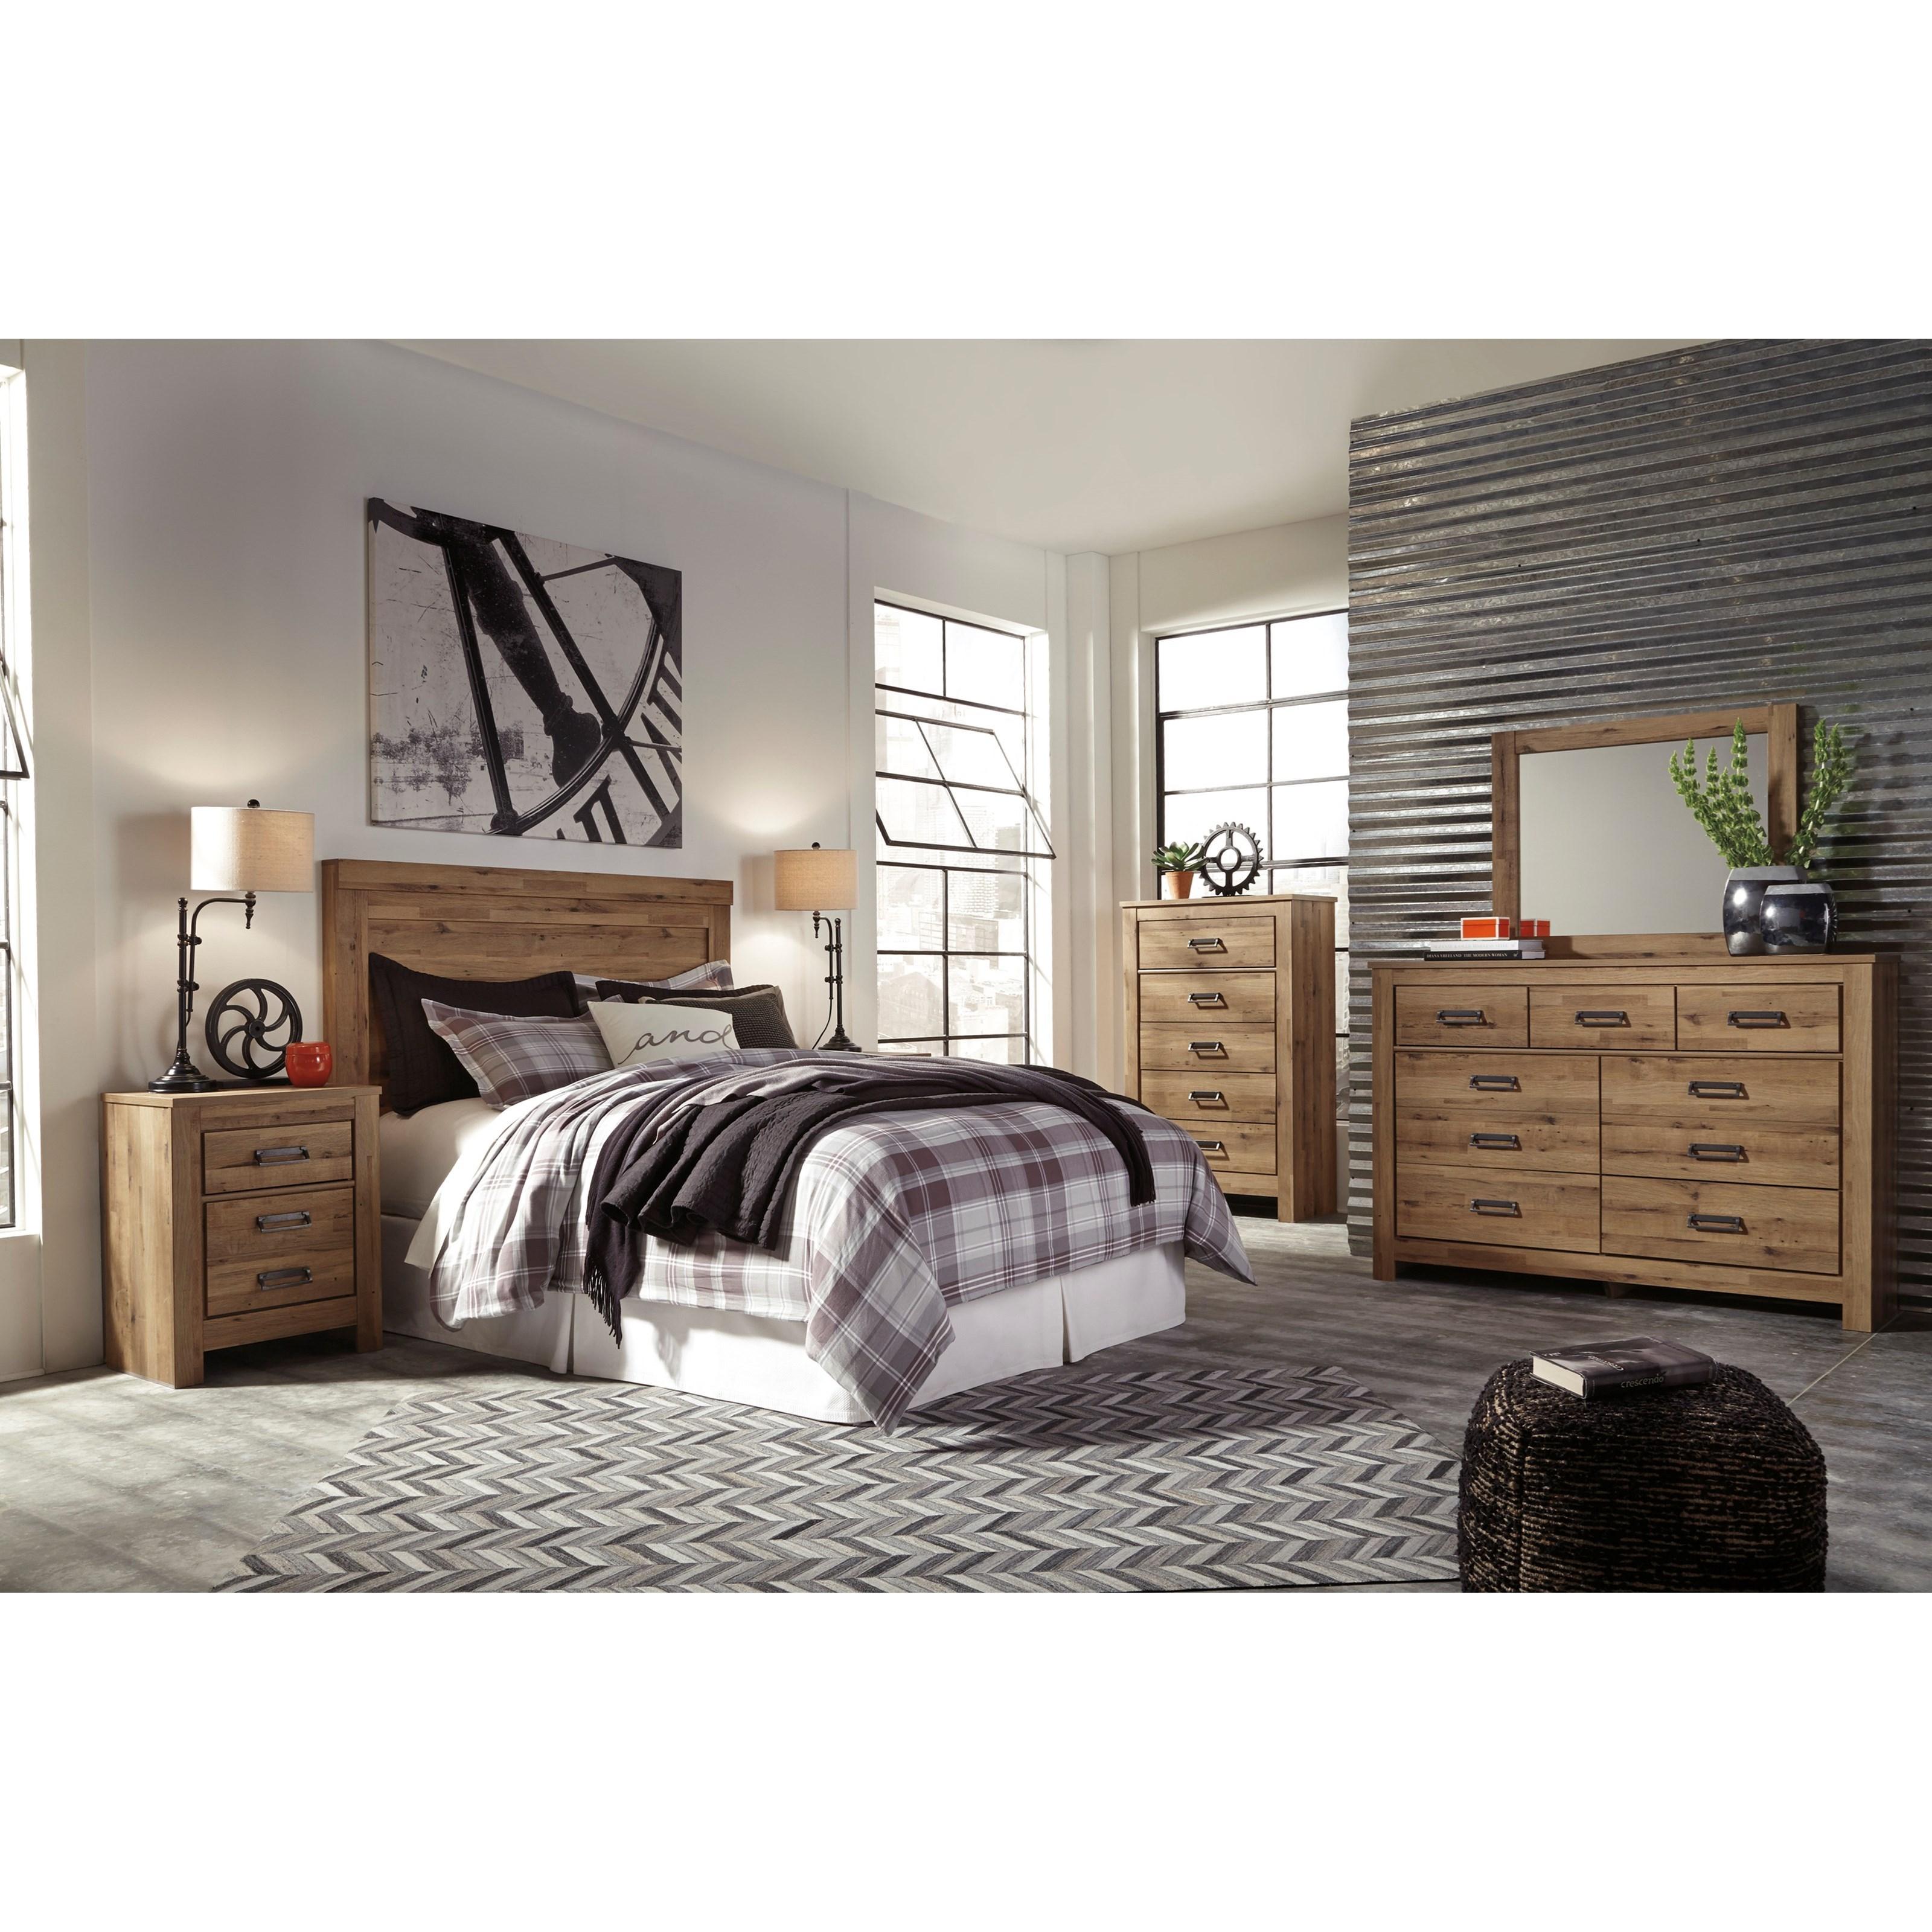 Signature Design By Ashley Cinrey King Bedroom Group Rotmans Bedroom Groups Worcester